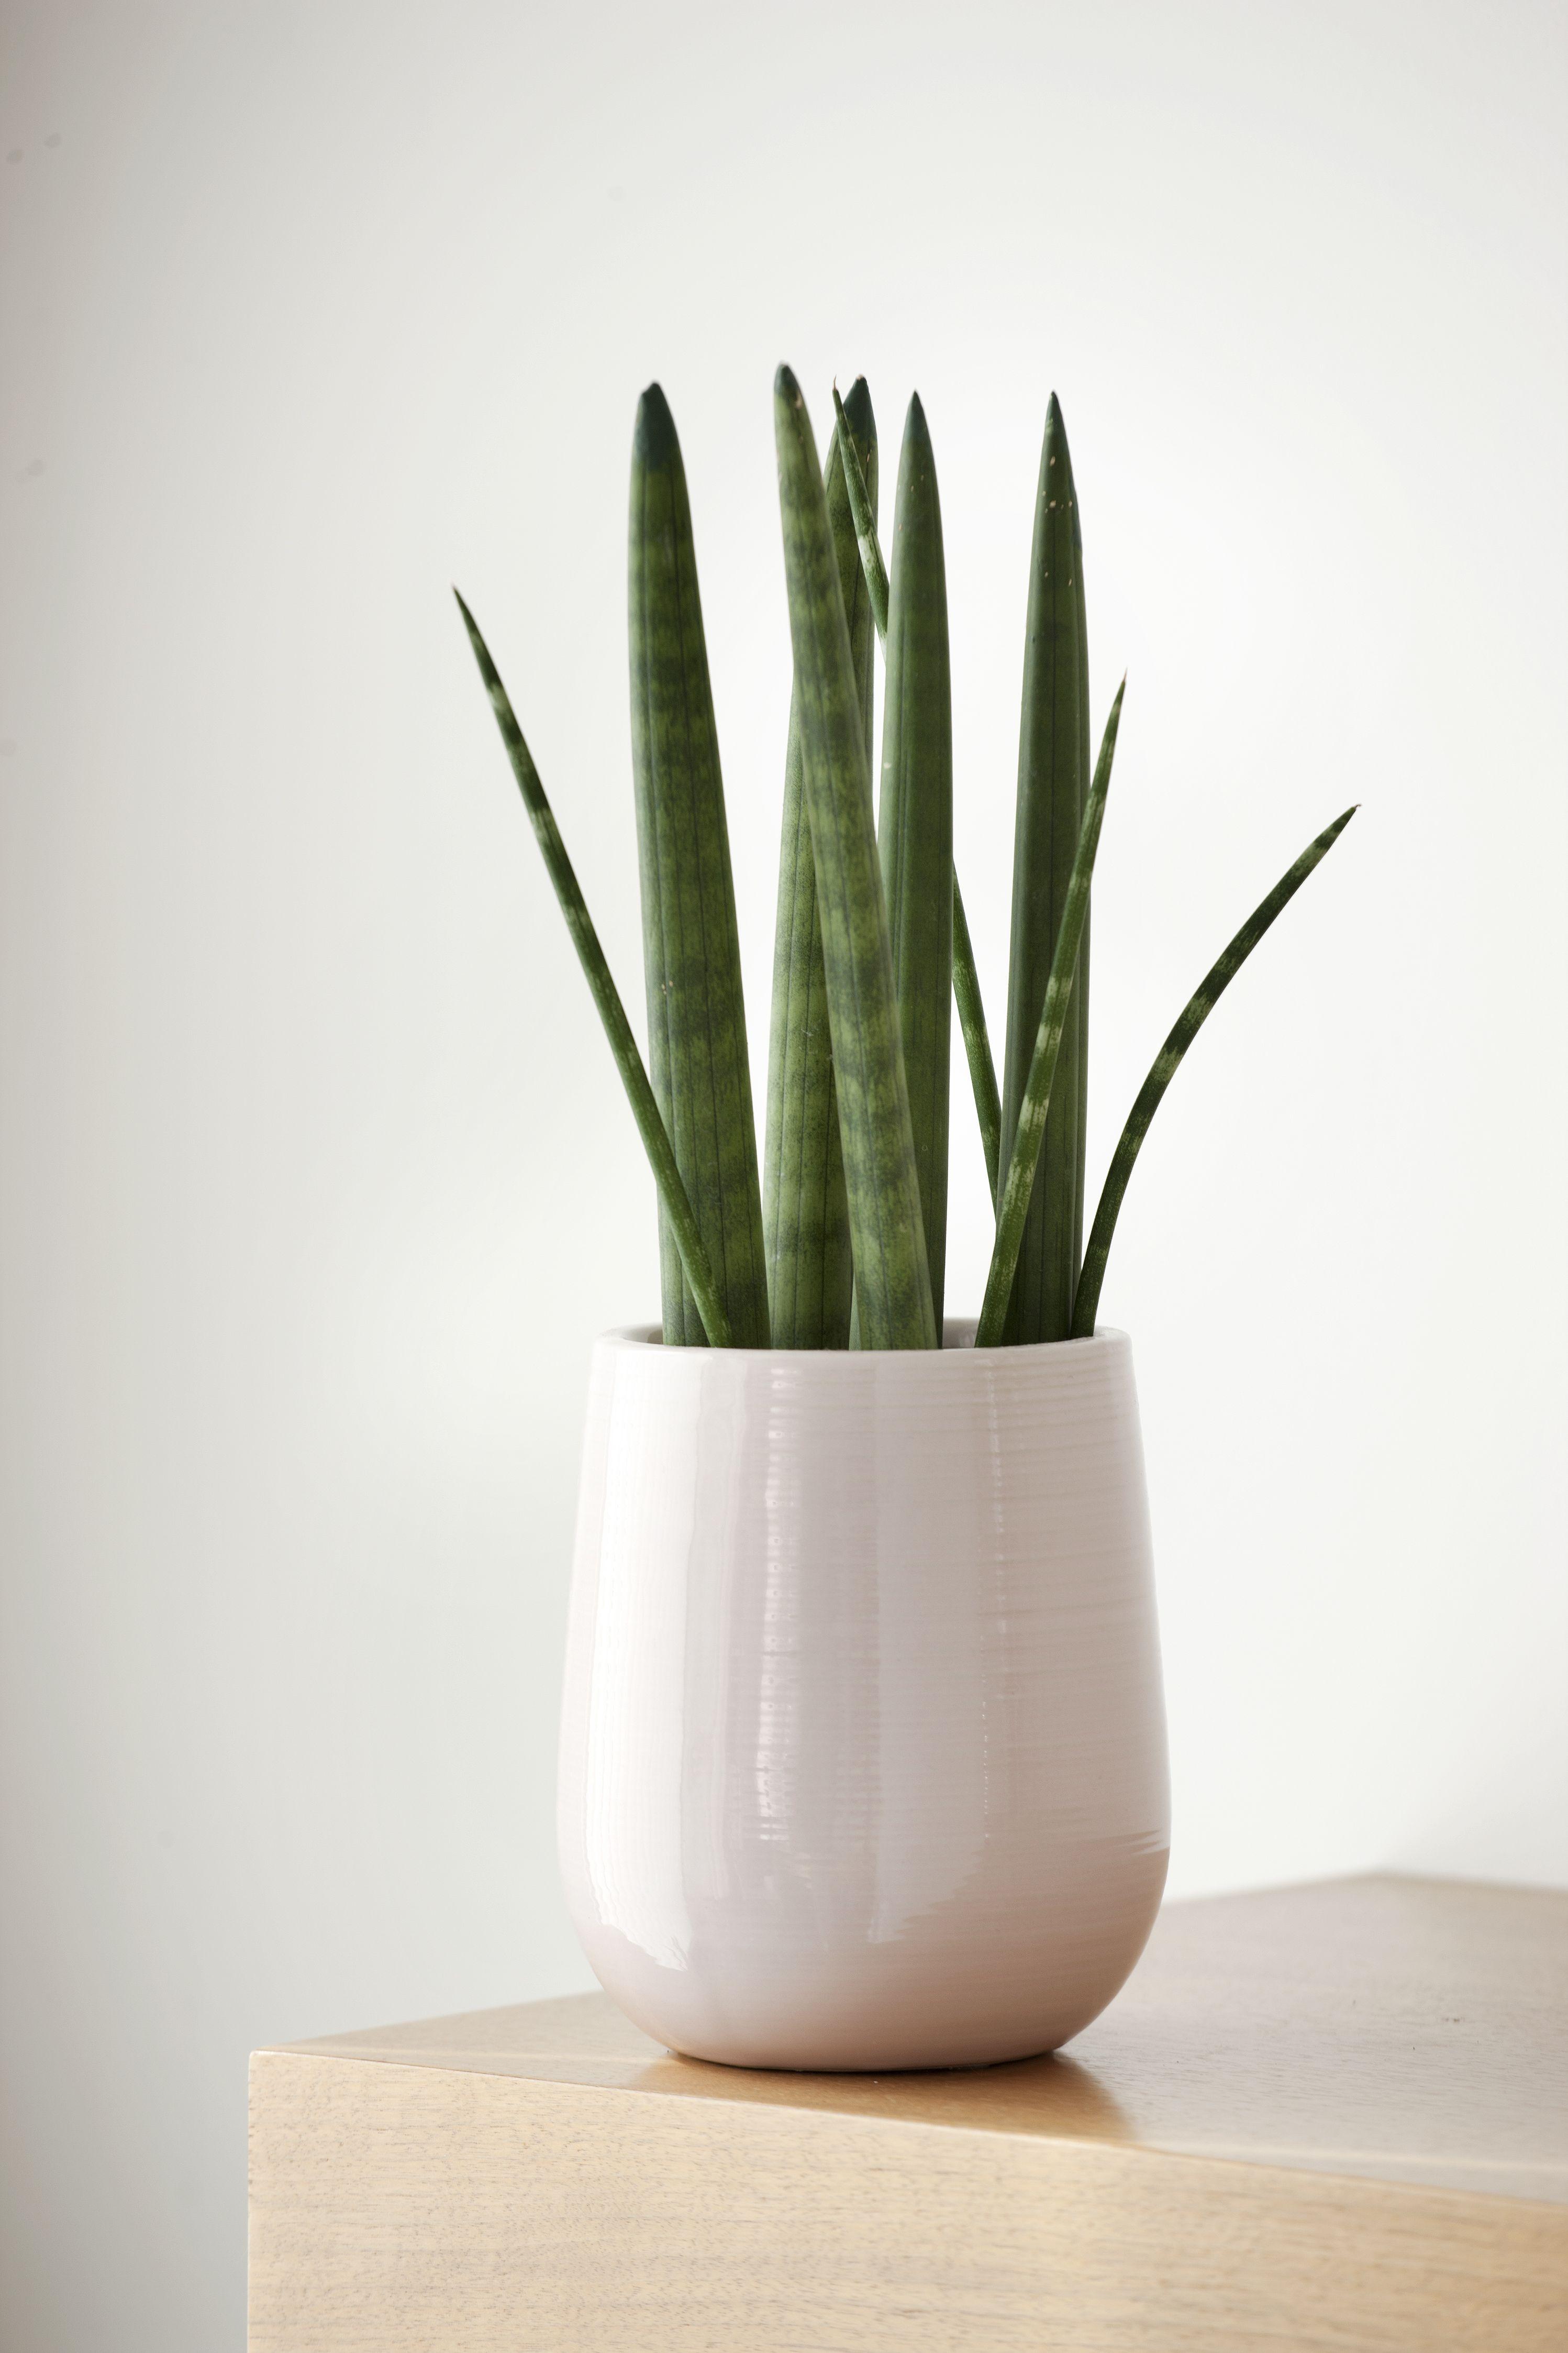 Sansevieria cylindrica  Plants, Bathroom plants, House plants